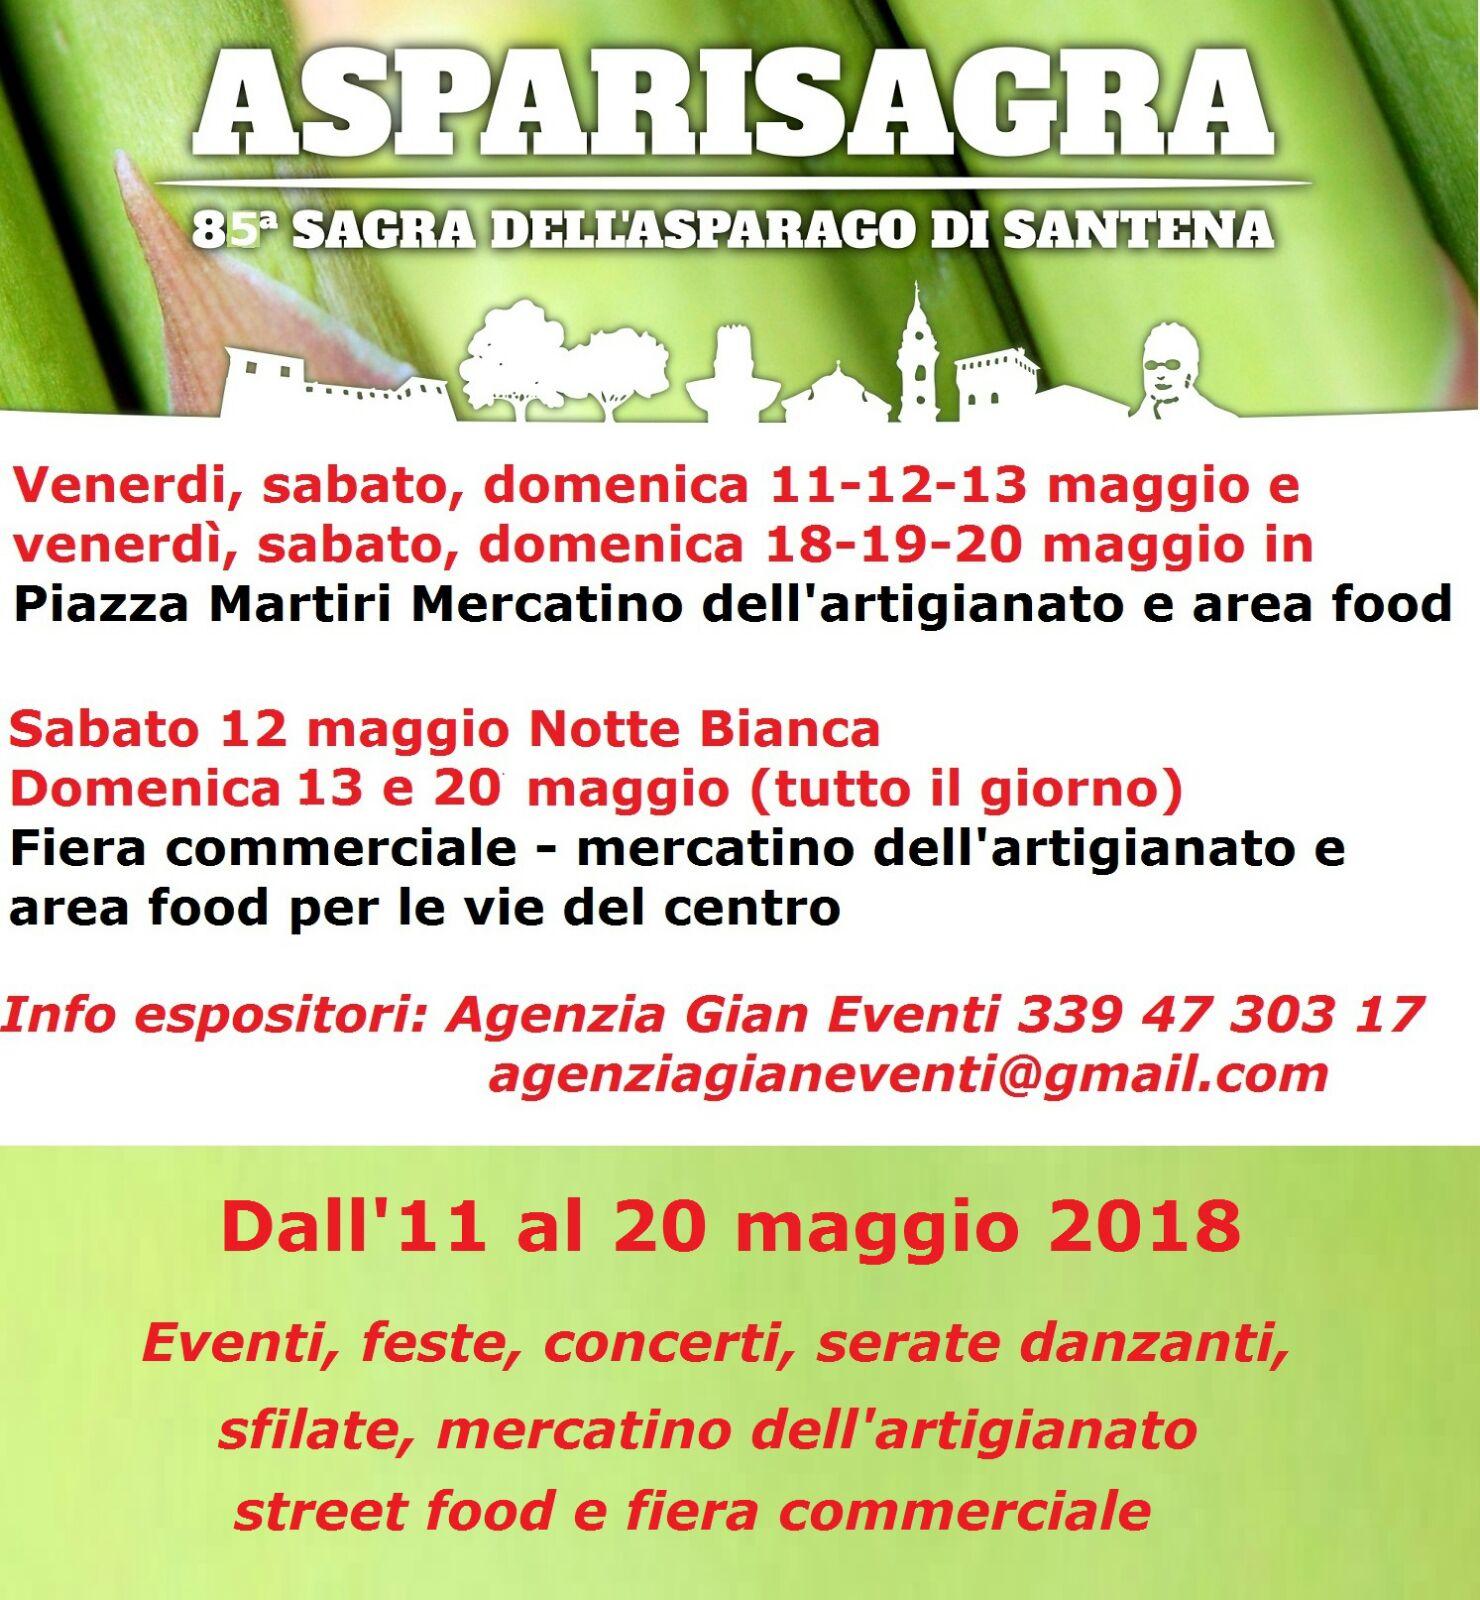 Asparisagra - 85* Sagra dell'asparago di Santena.